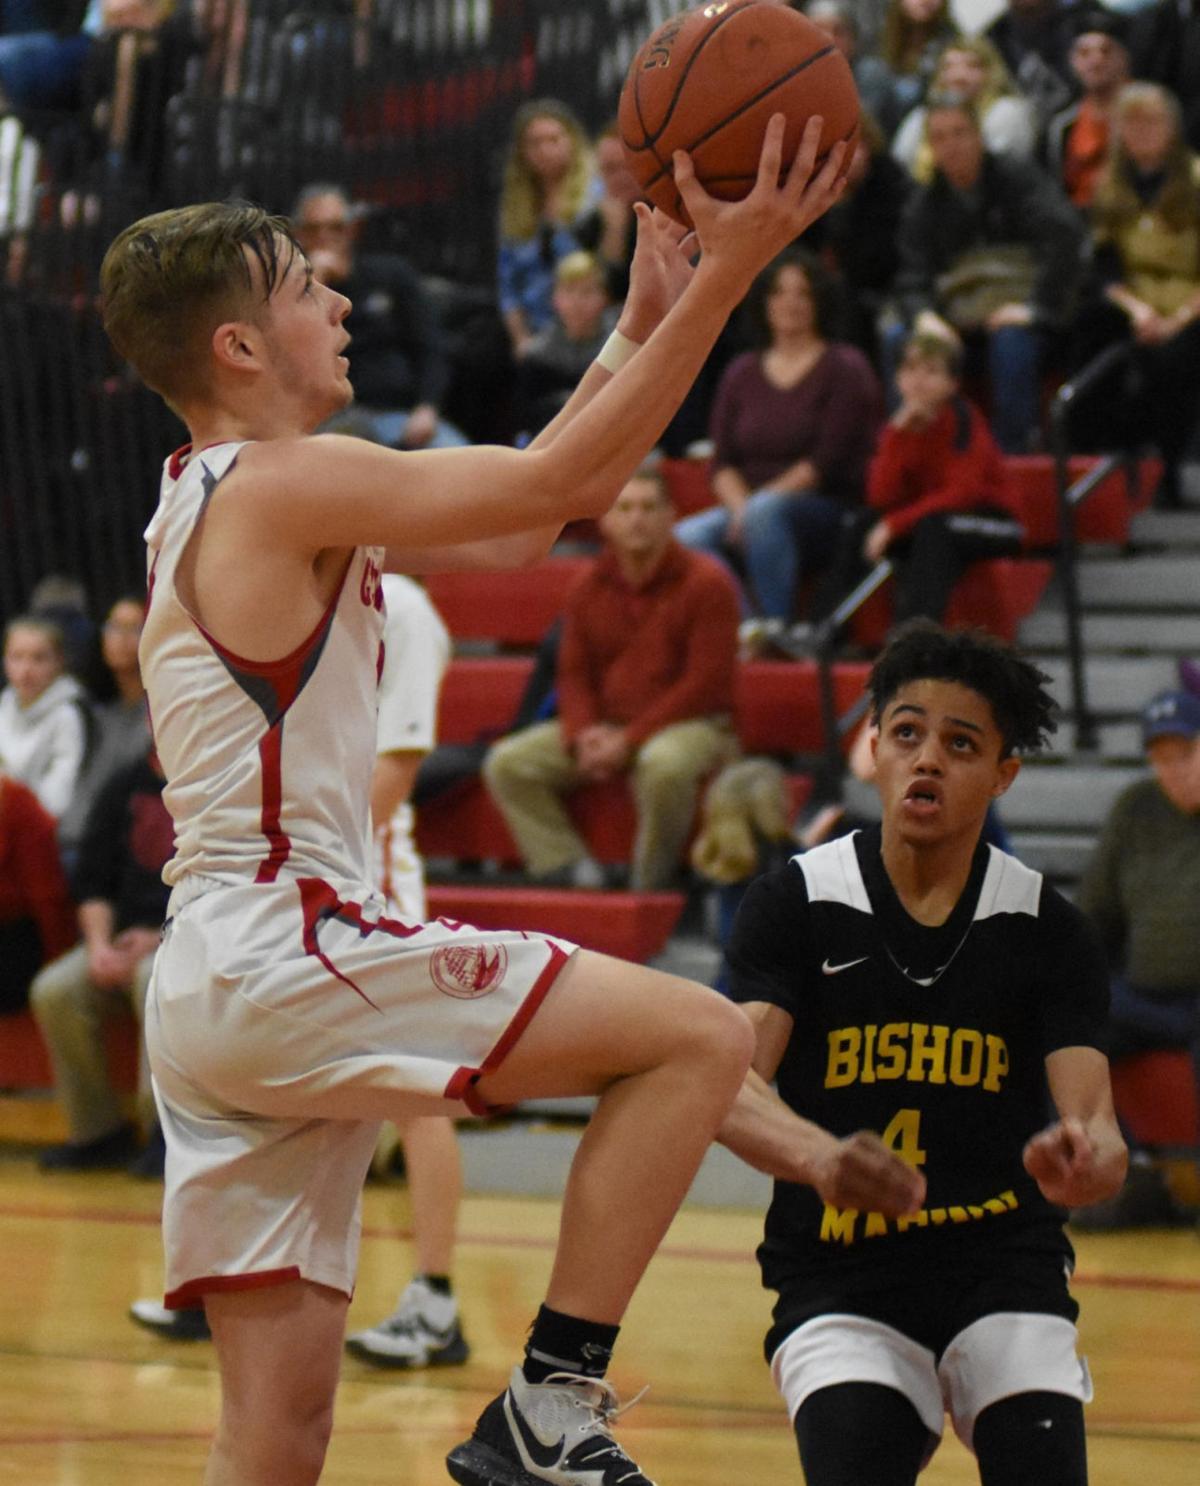 BOYS BASKETBALL: Bishop Maginn rolls to CHVL win over Germantown